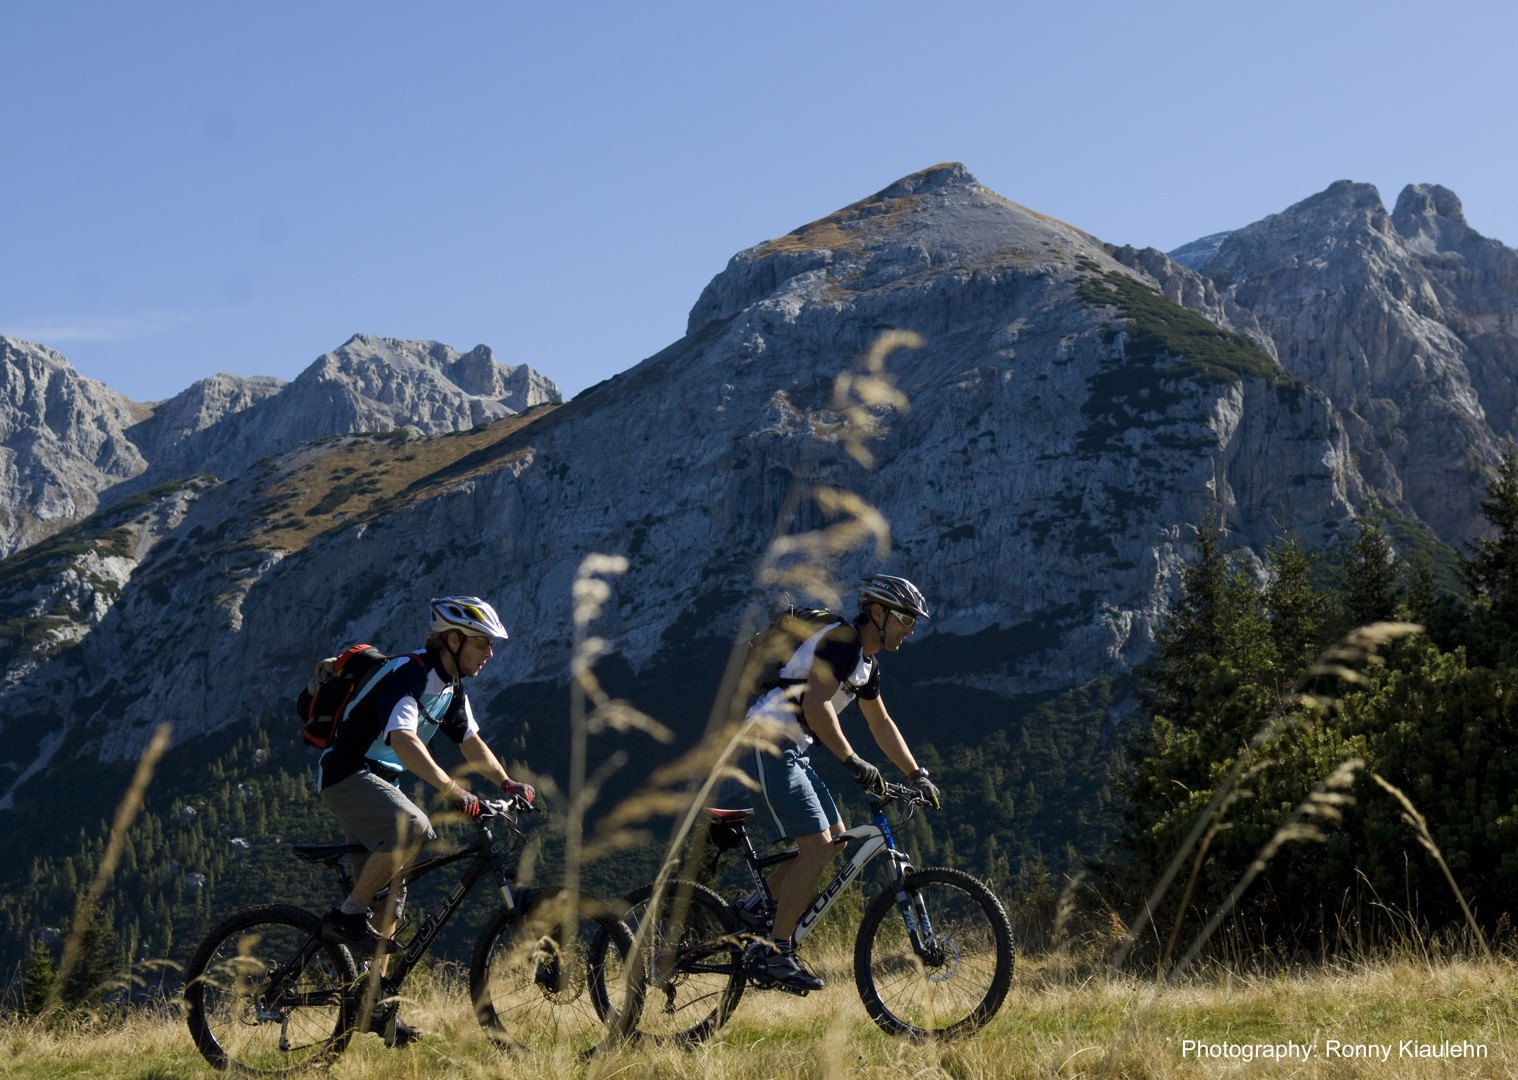 dolomites6.jpg - Italy - Dolomites of Brenta - Guided Mountain Bike Holiday - Mountain Biking